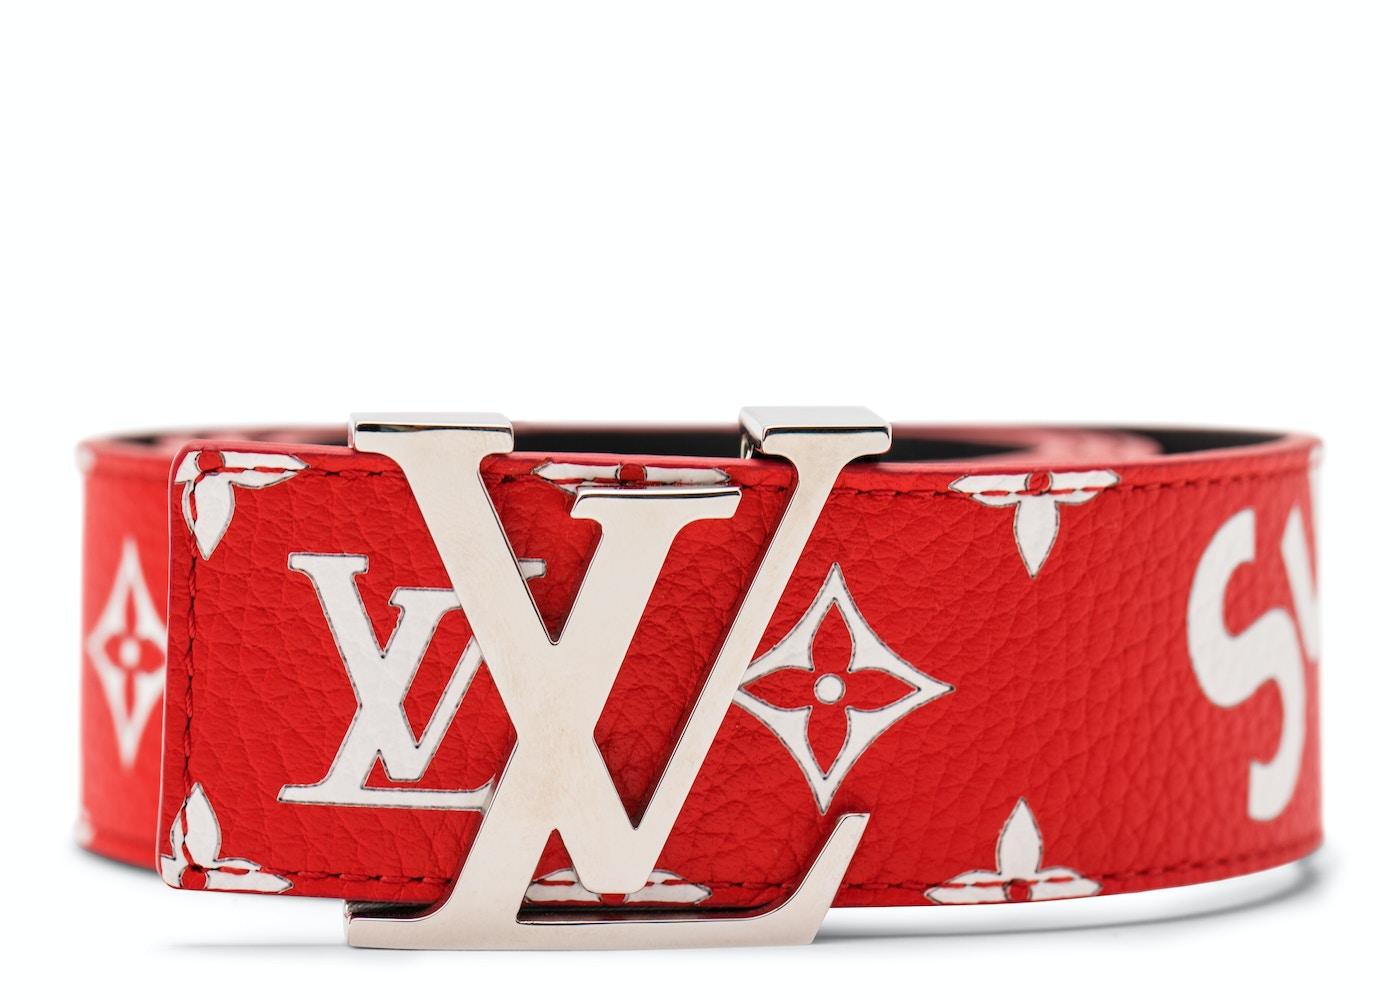 miglior servizio b8e4d 8db93 Louis Vuitton x Supreme Initiales Belt 40 MM Monogram Red